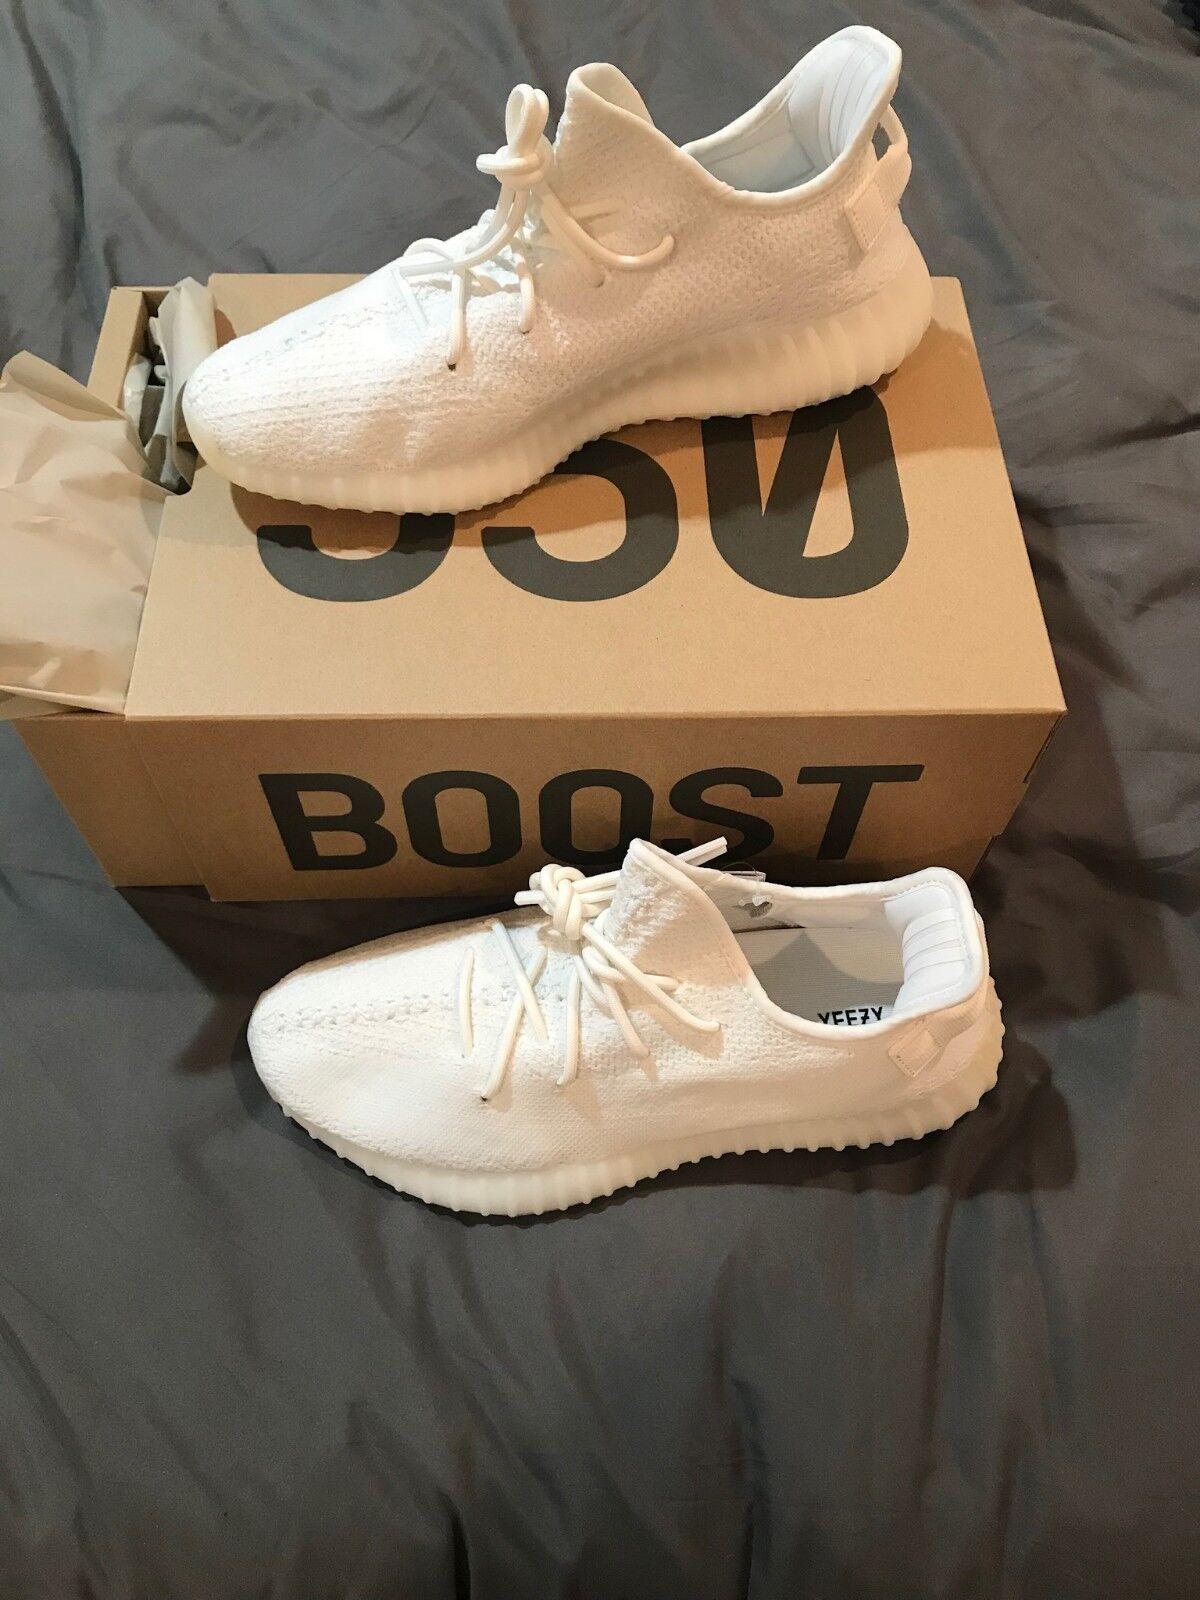 Yeezy auftrieb 350 v2 triple Weiß (sahne) (sahne) Weiß größe 10,5, adidas b5d04e